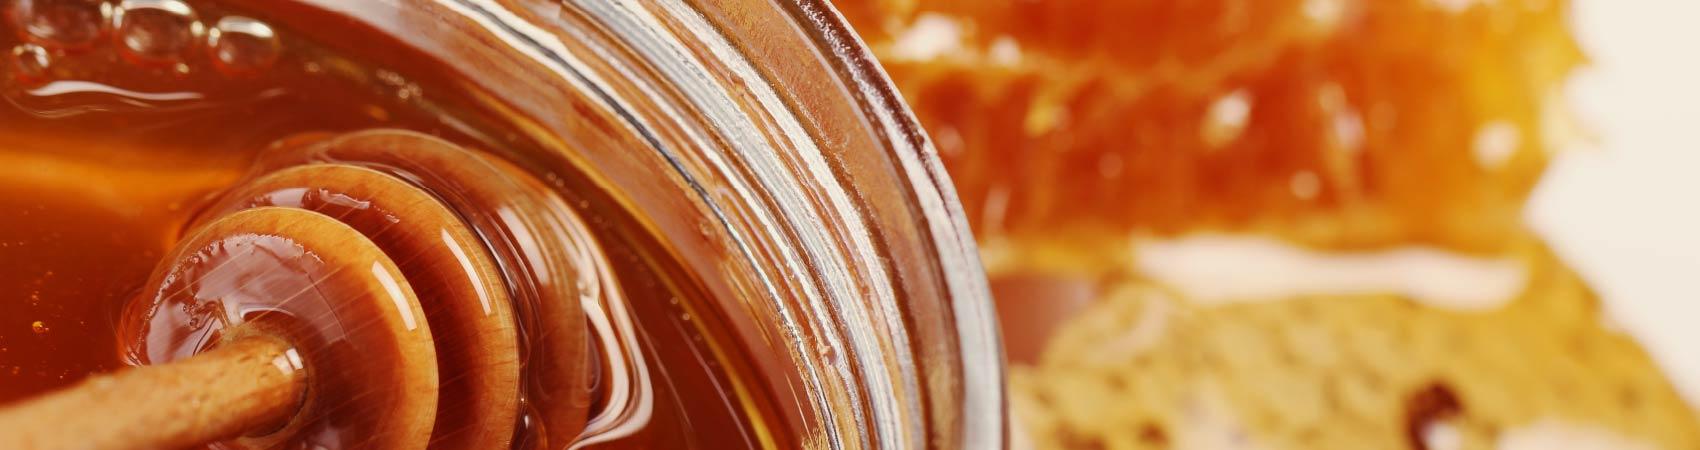 Un frasco de miel en primer plano.